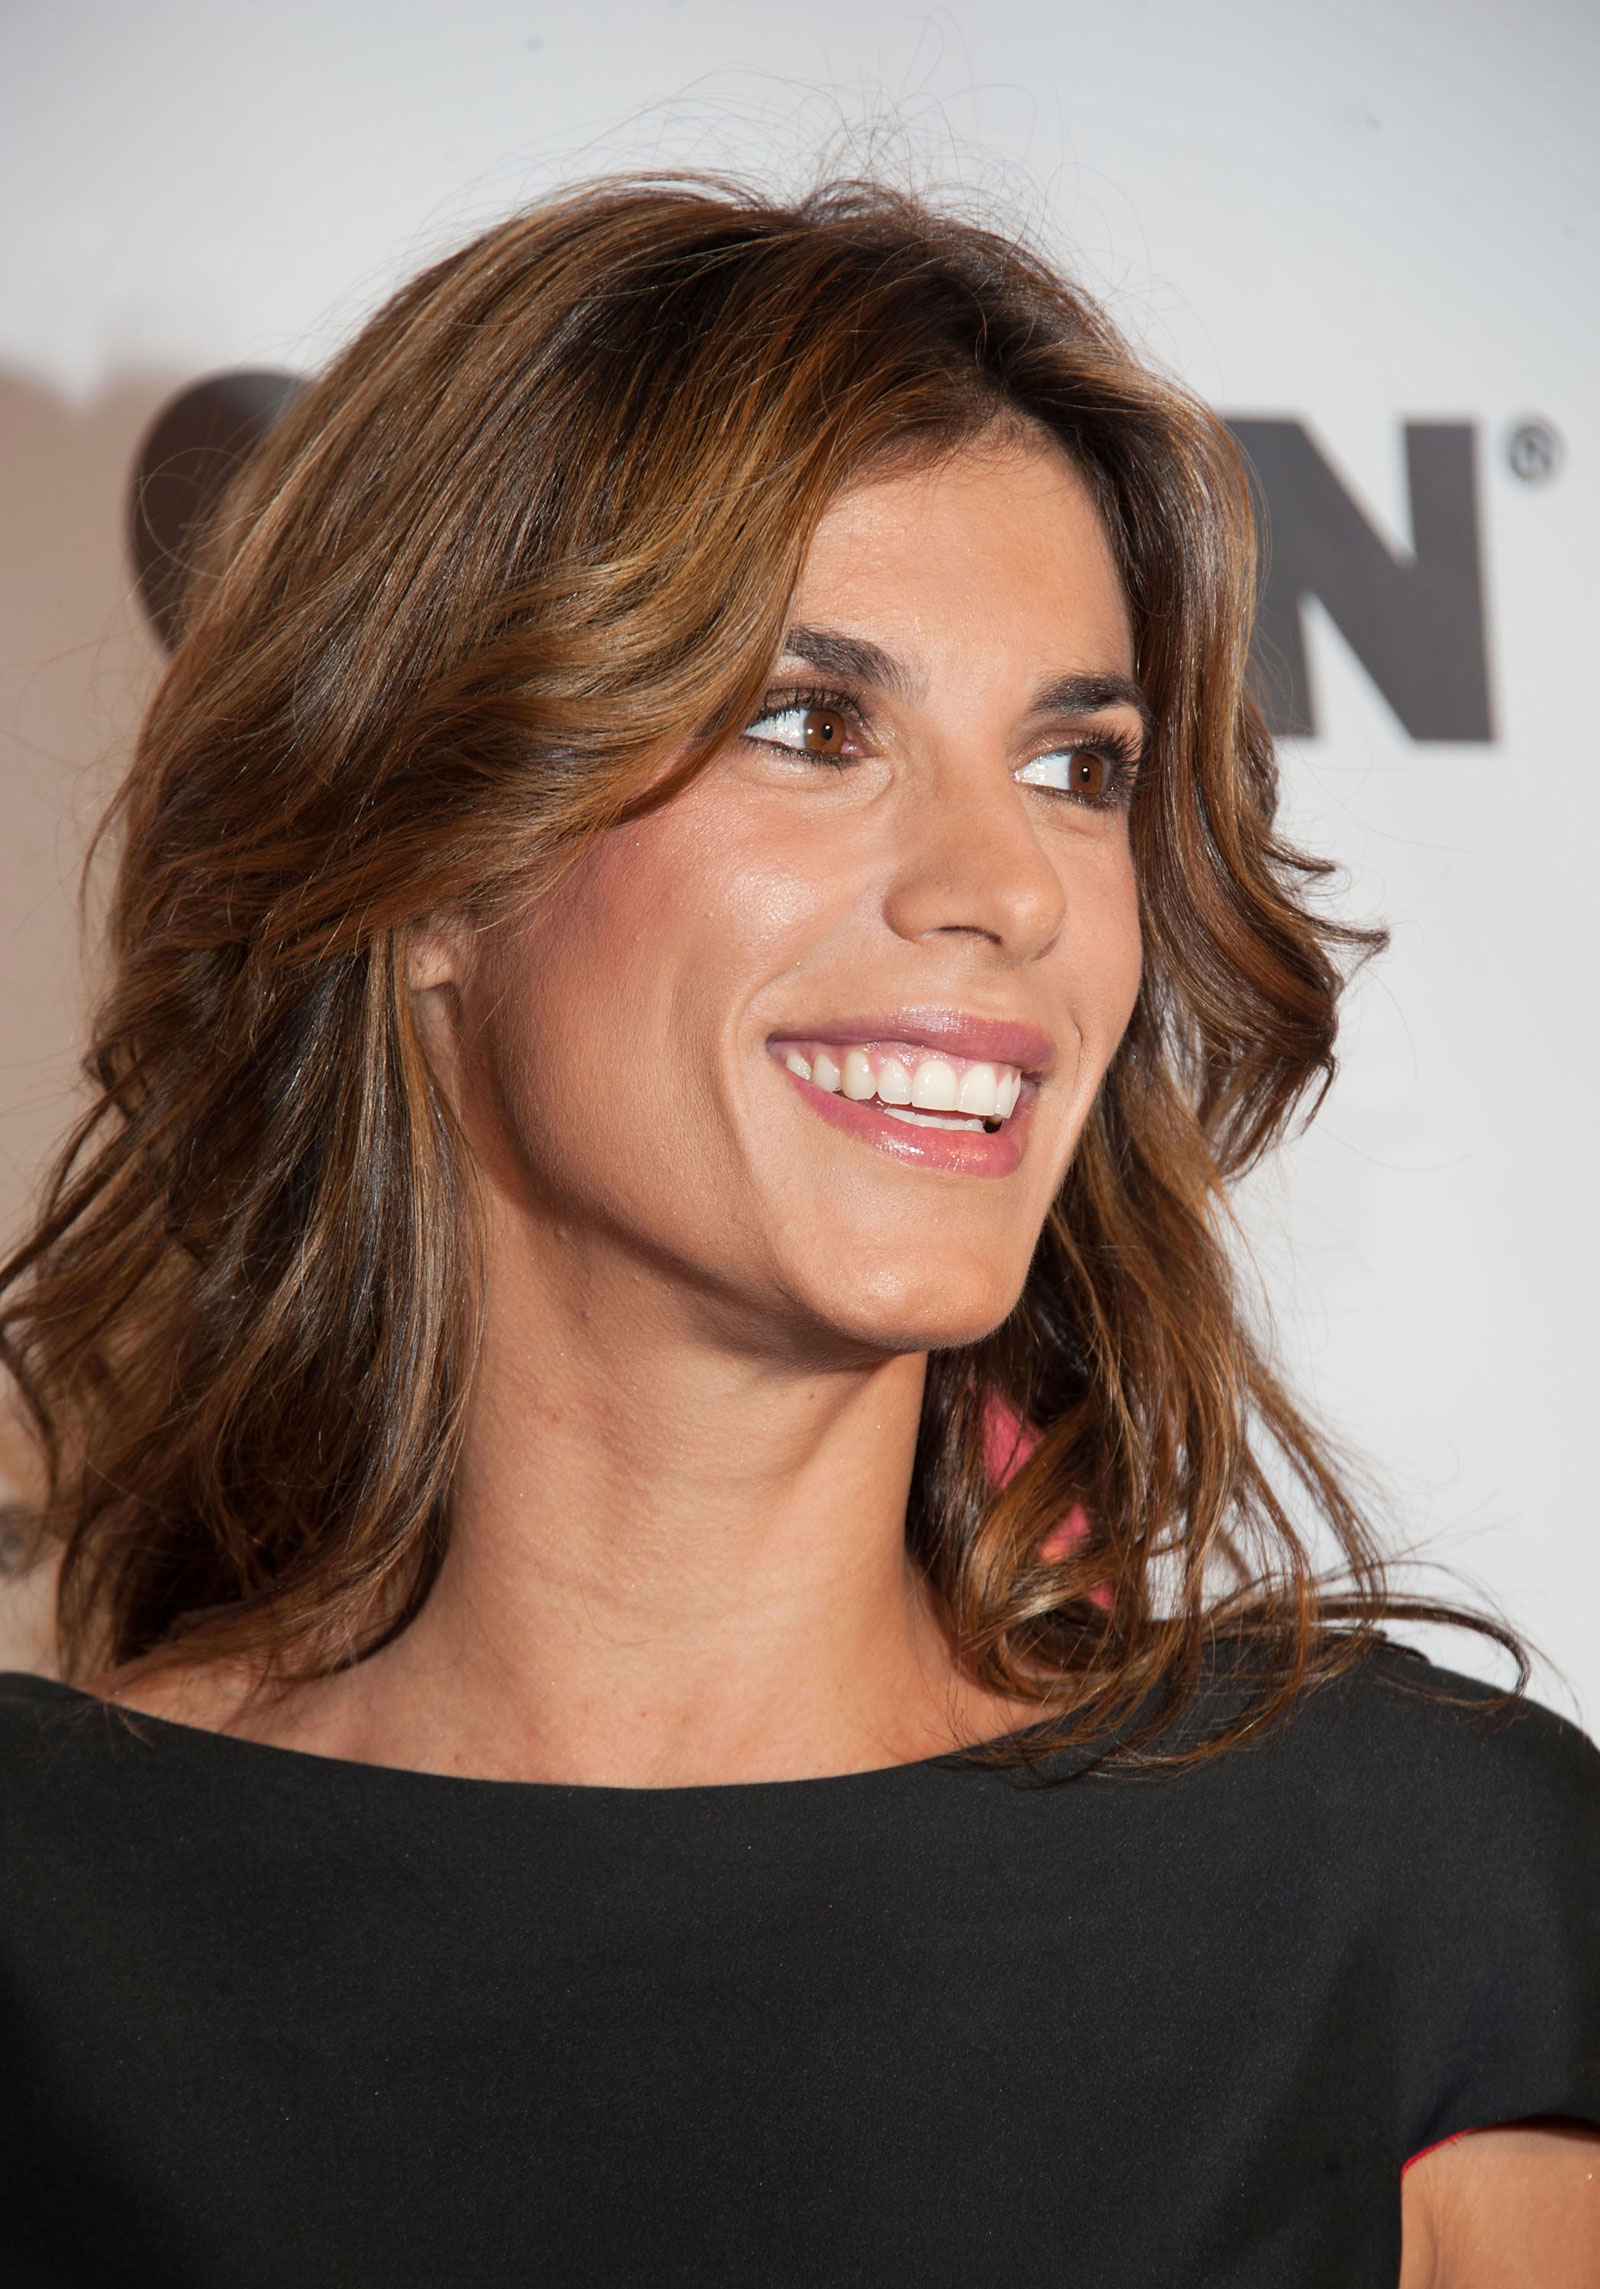 Elisabetta Canalis At The 2011 GLSEN Respect Awards